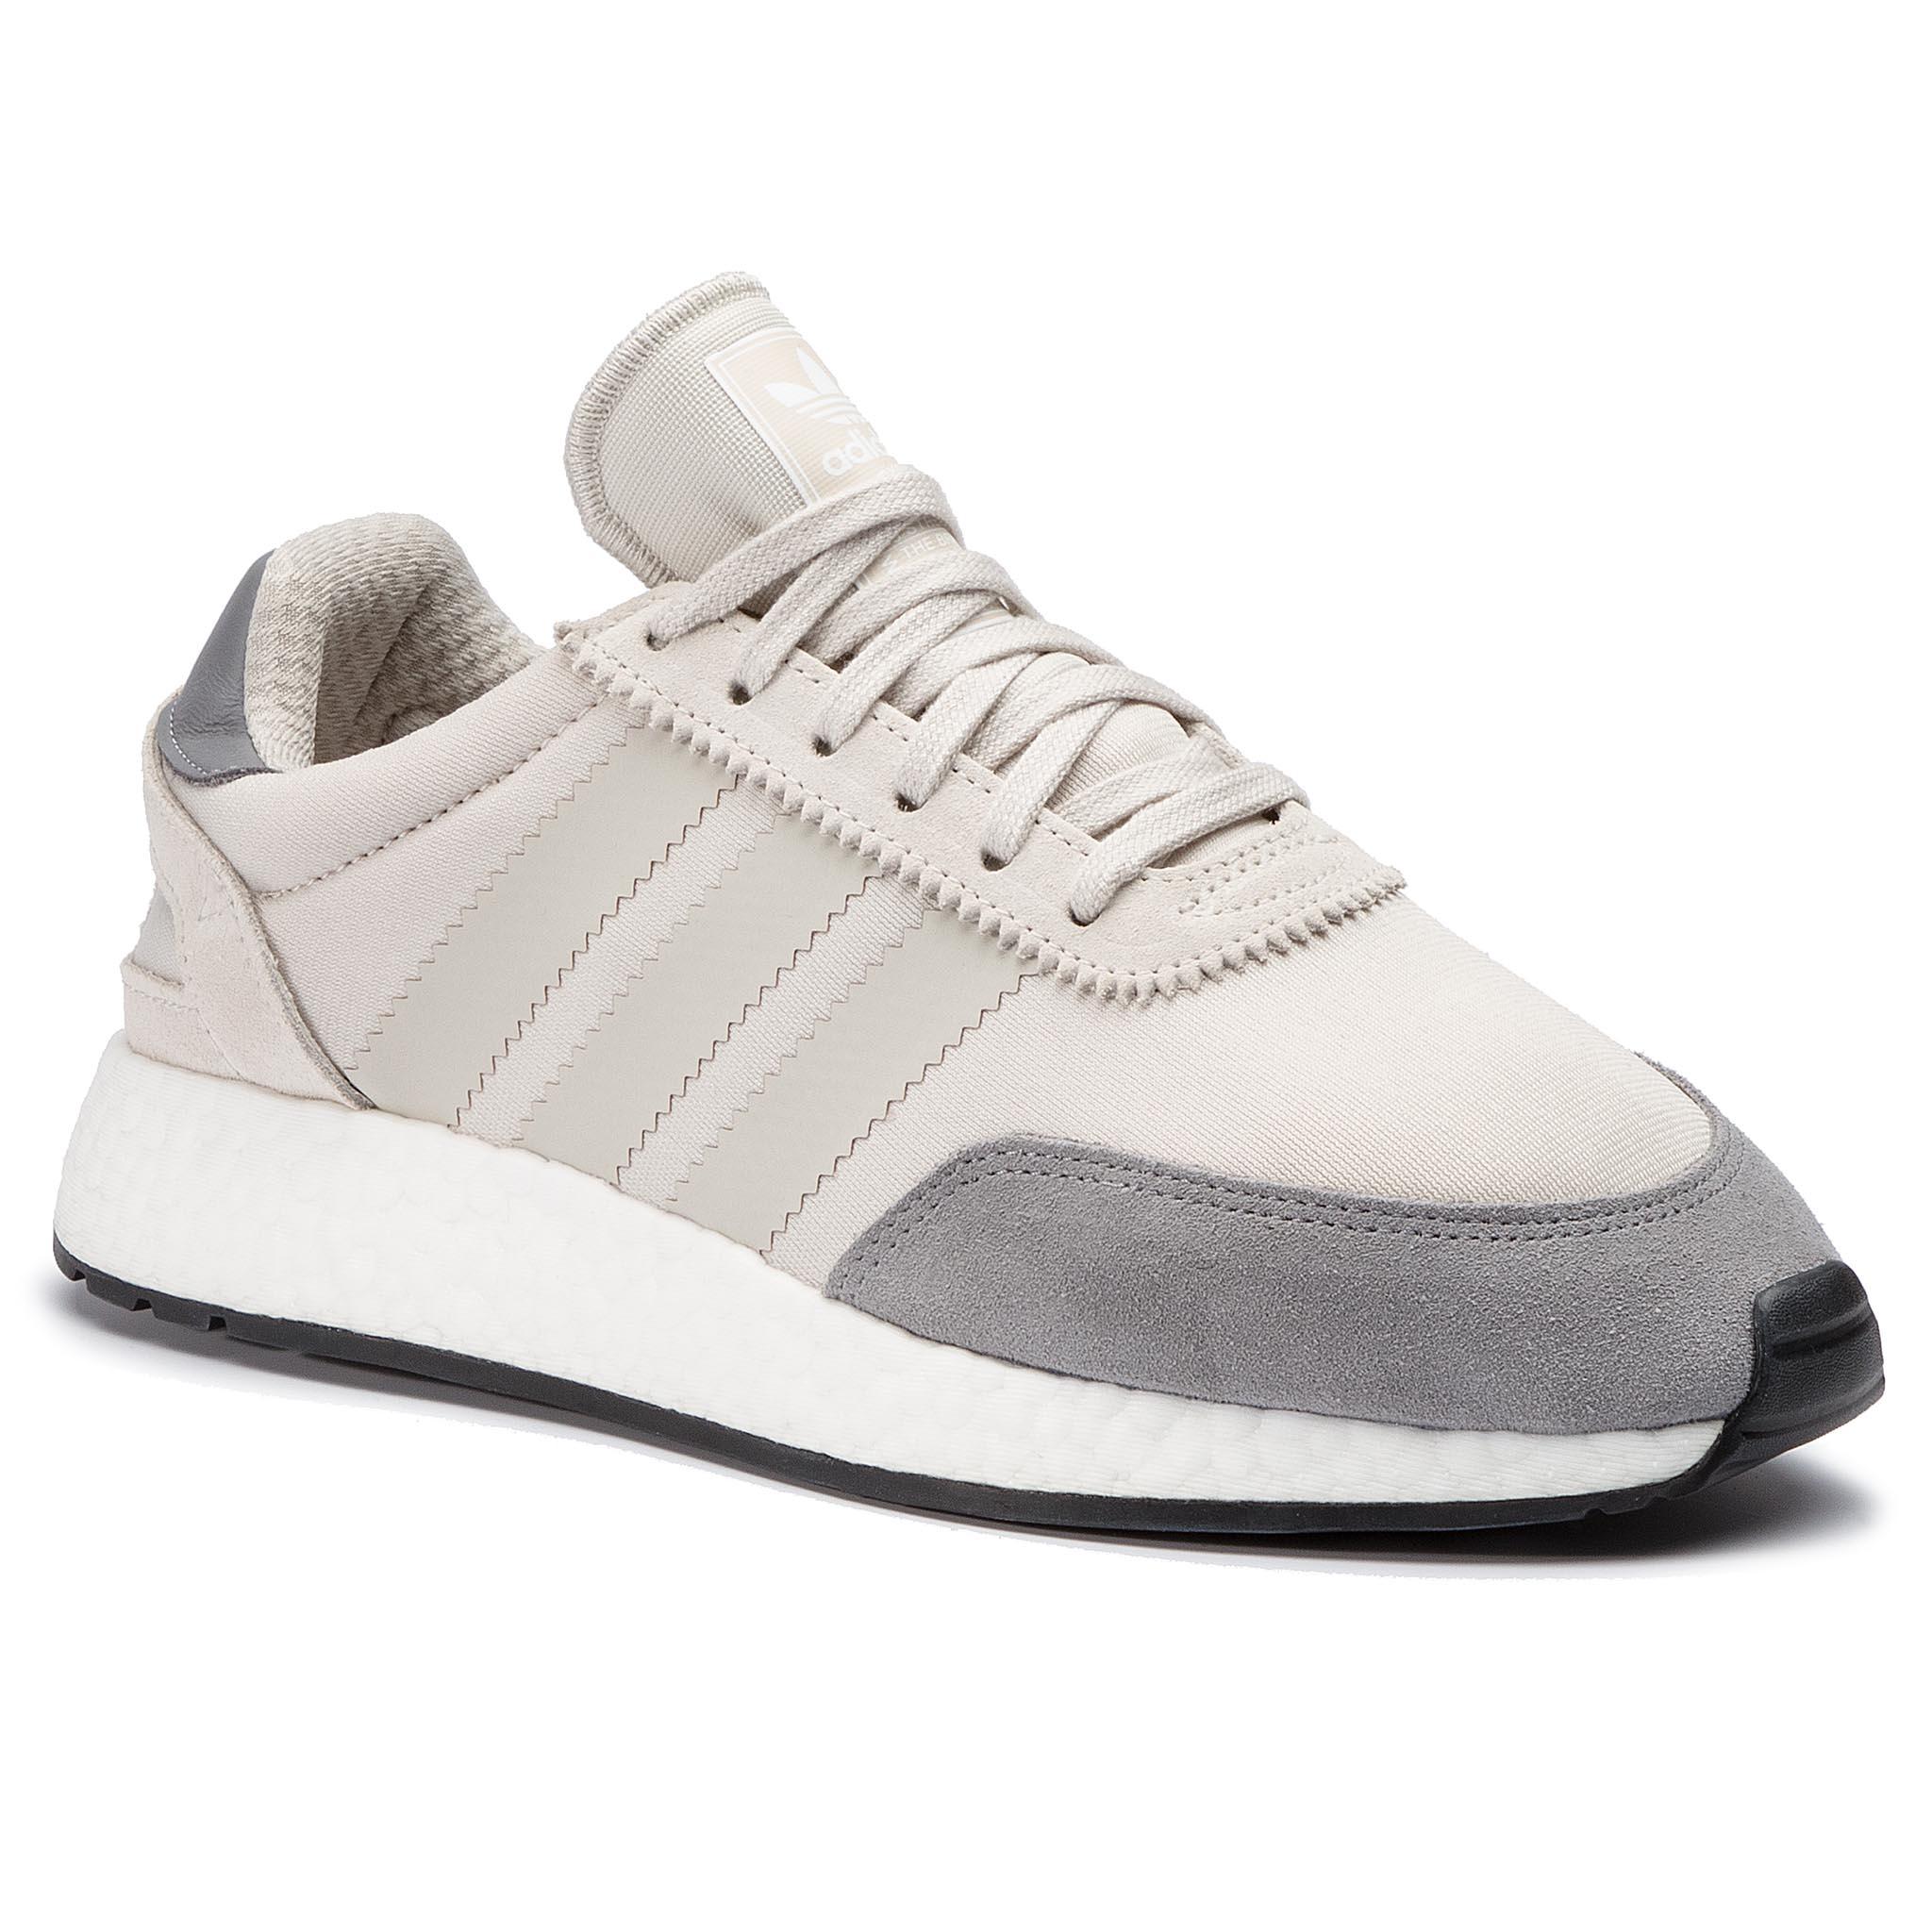 Topánky adidas - I-5923 BD7805 Raw White/Raw White/Grey Three